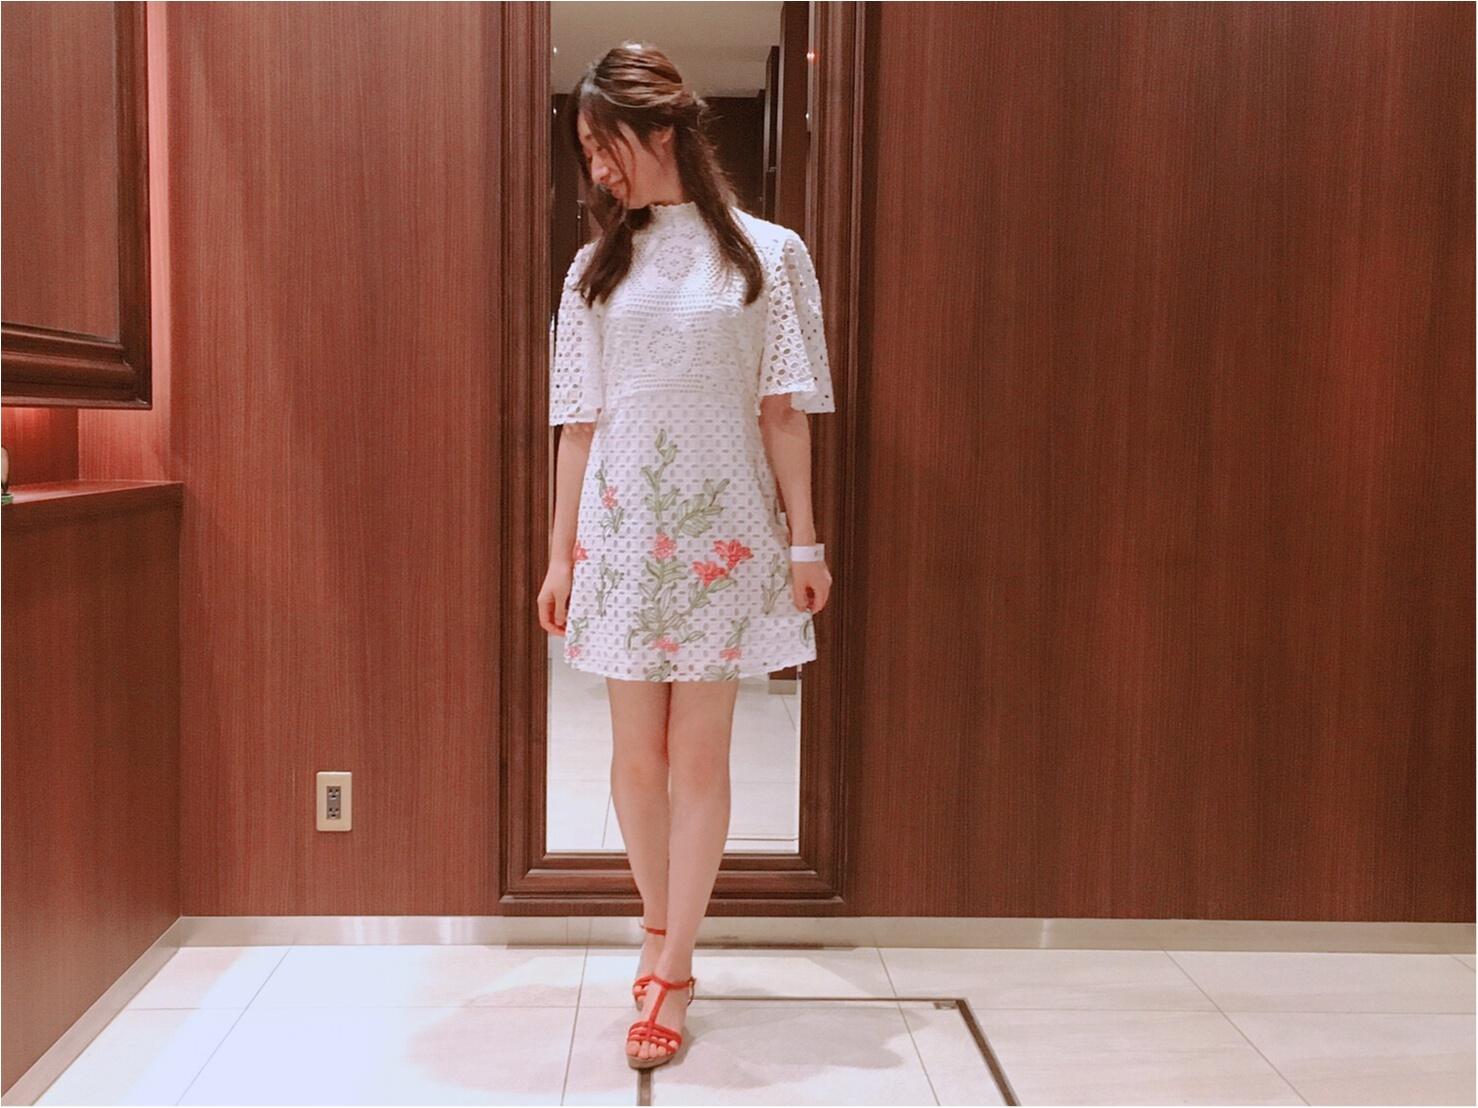 【ZARA】刺繍入りレースワンピース(¥7,990)がクラシカルで可愛い♡_2